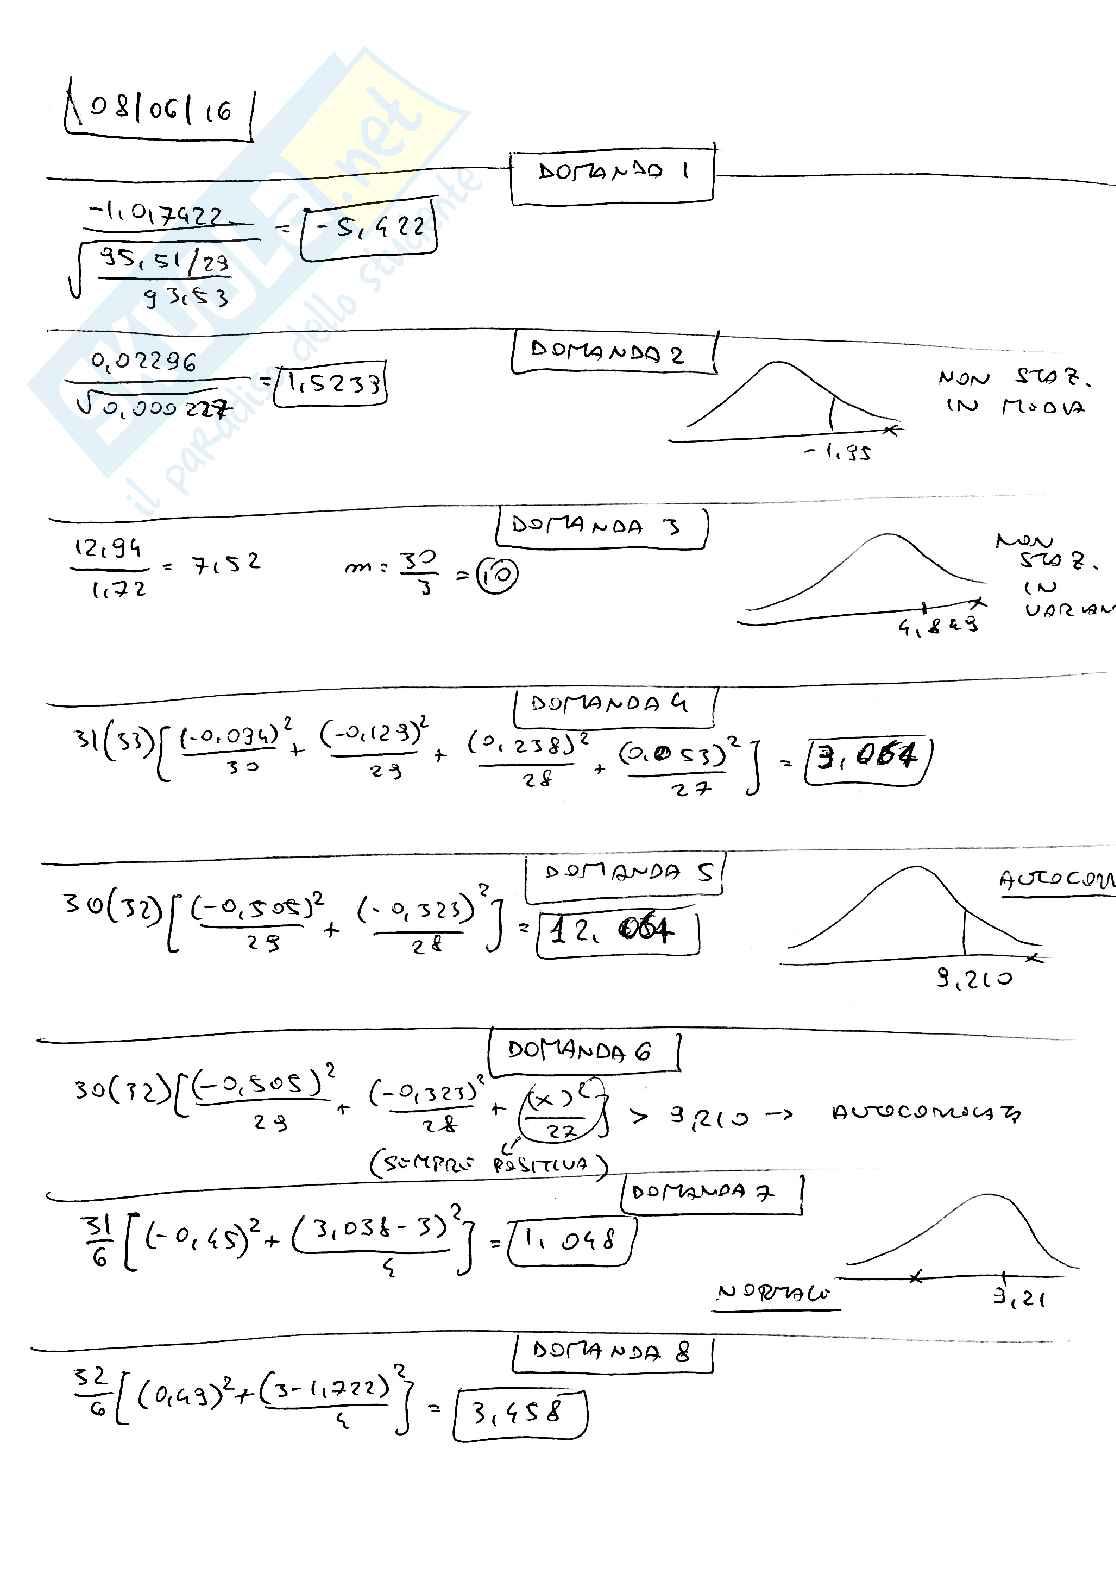 Metodi quantitativi per il management Pag. 41